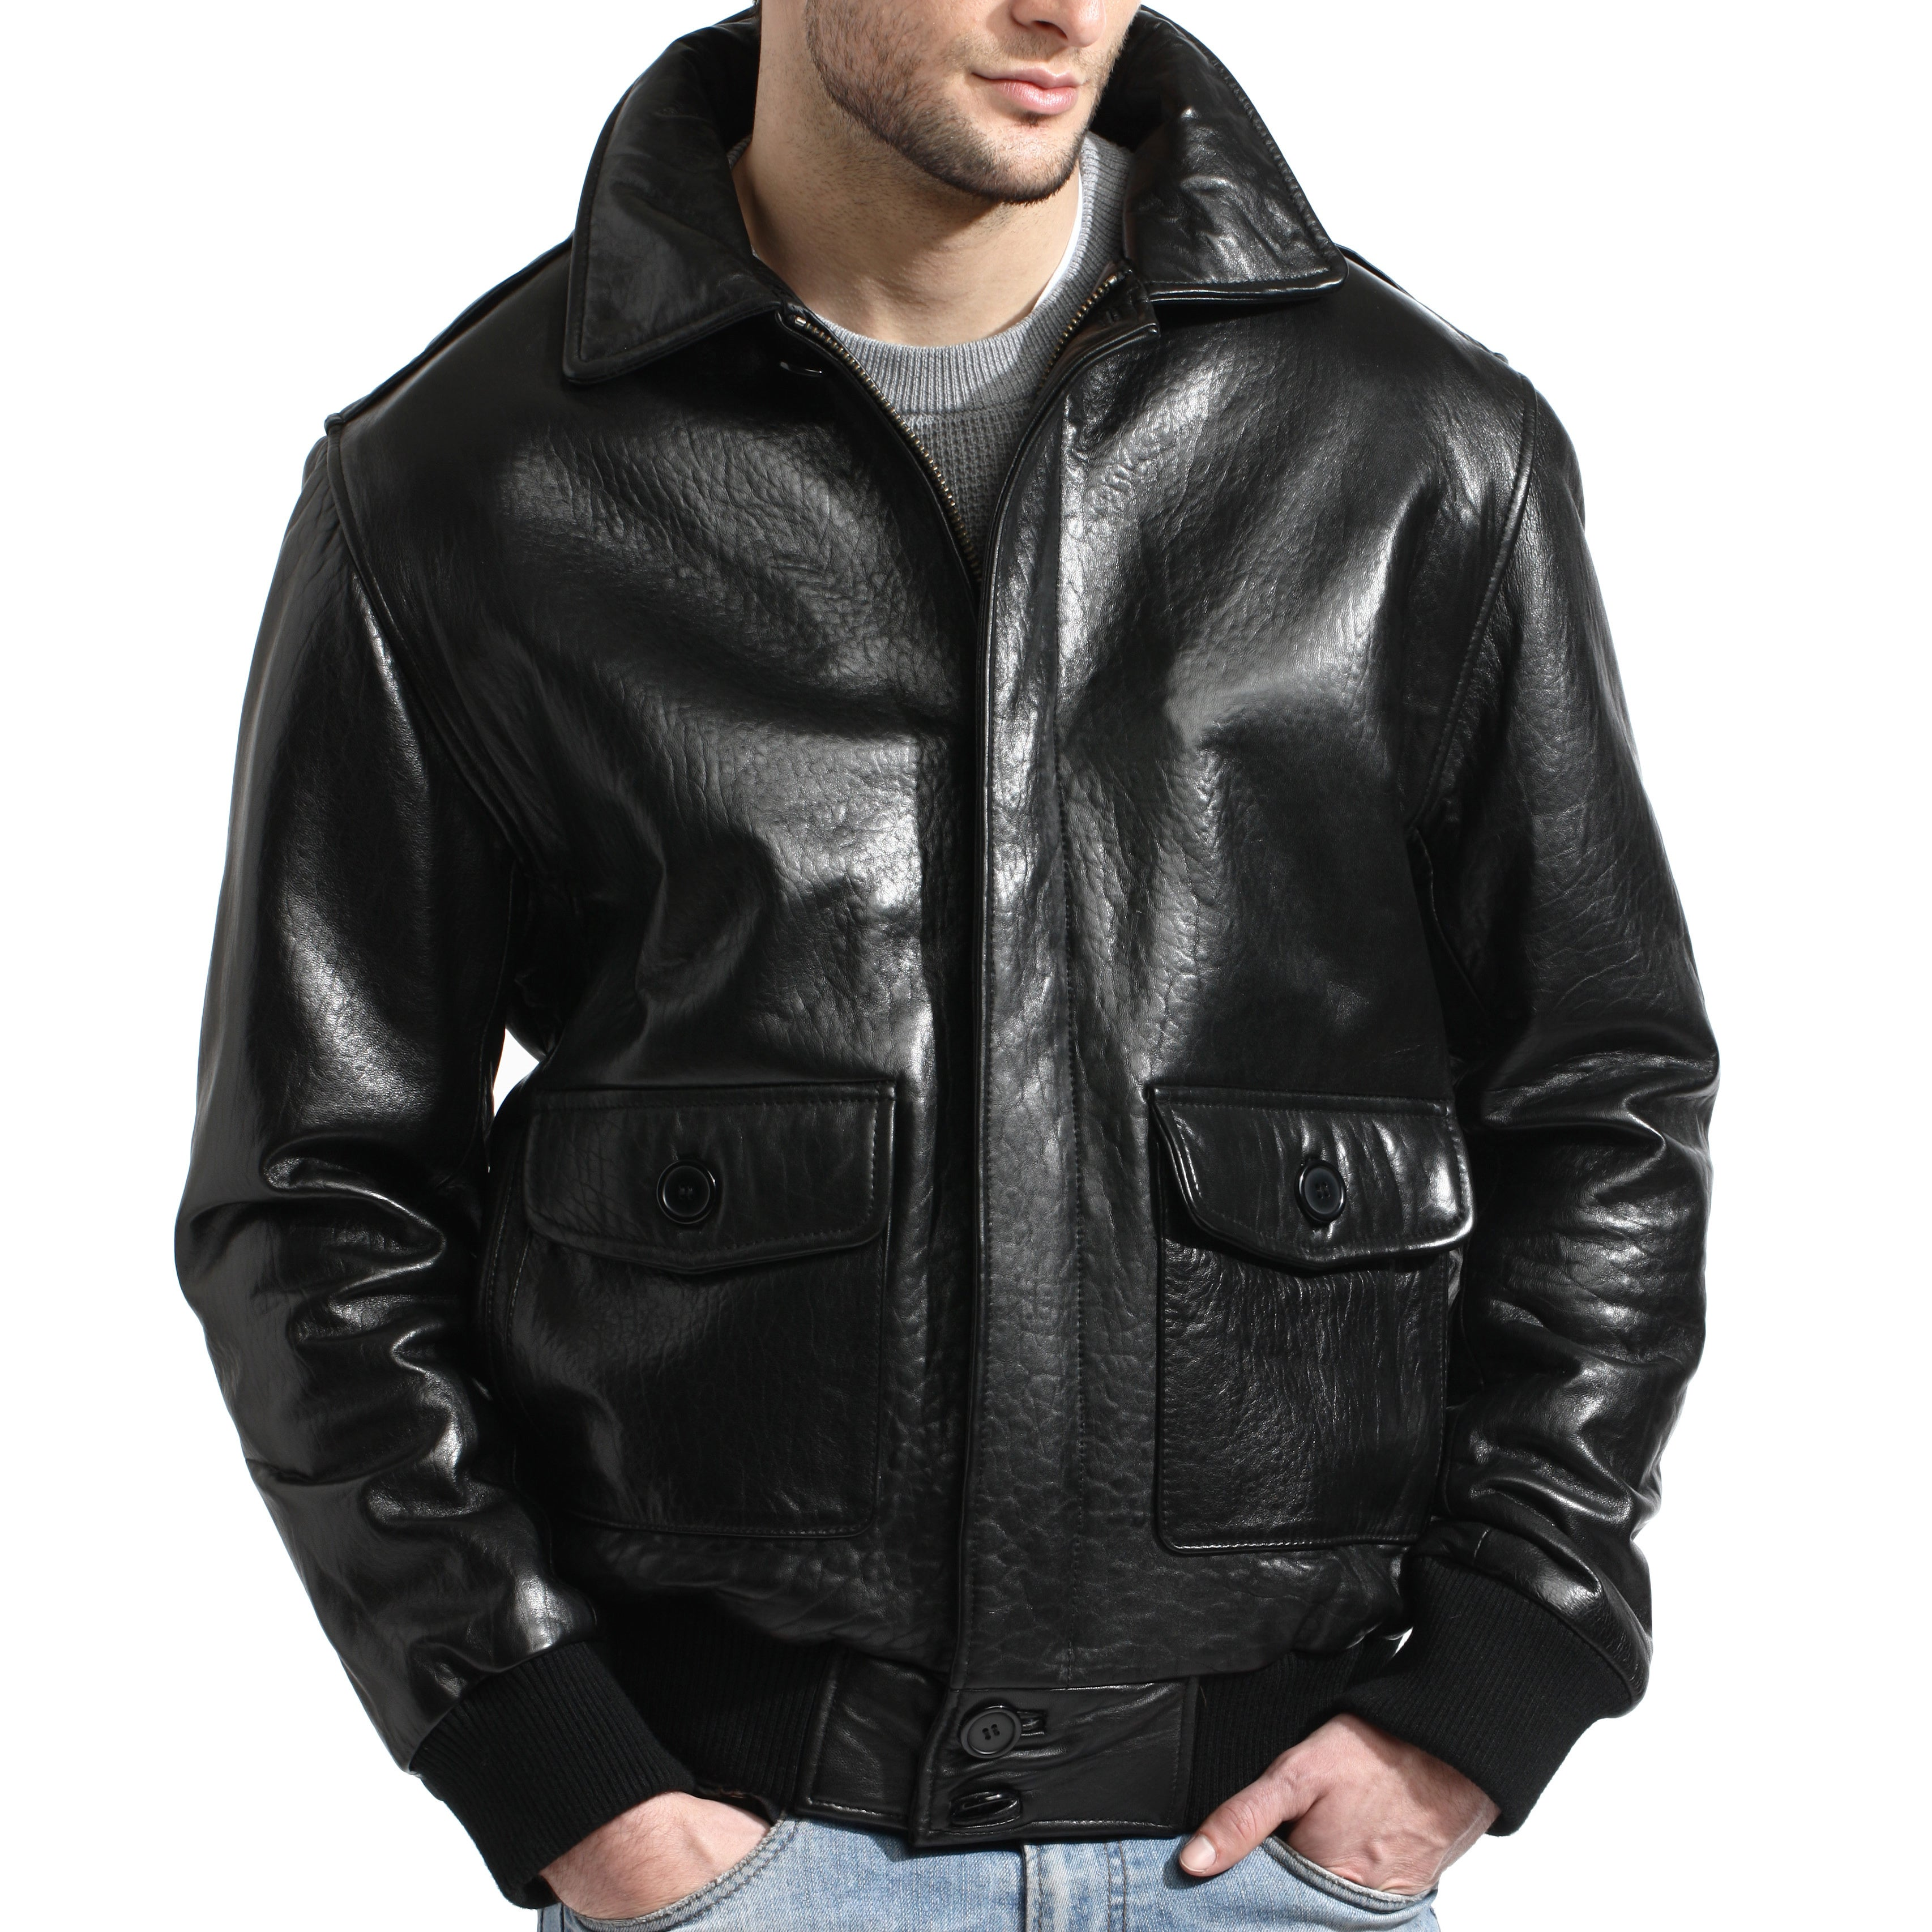 cc6def370 Men's Black Lambskin Leather Bomber Jacket